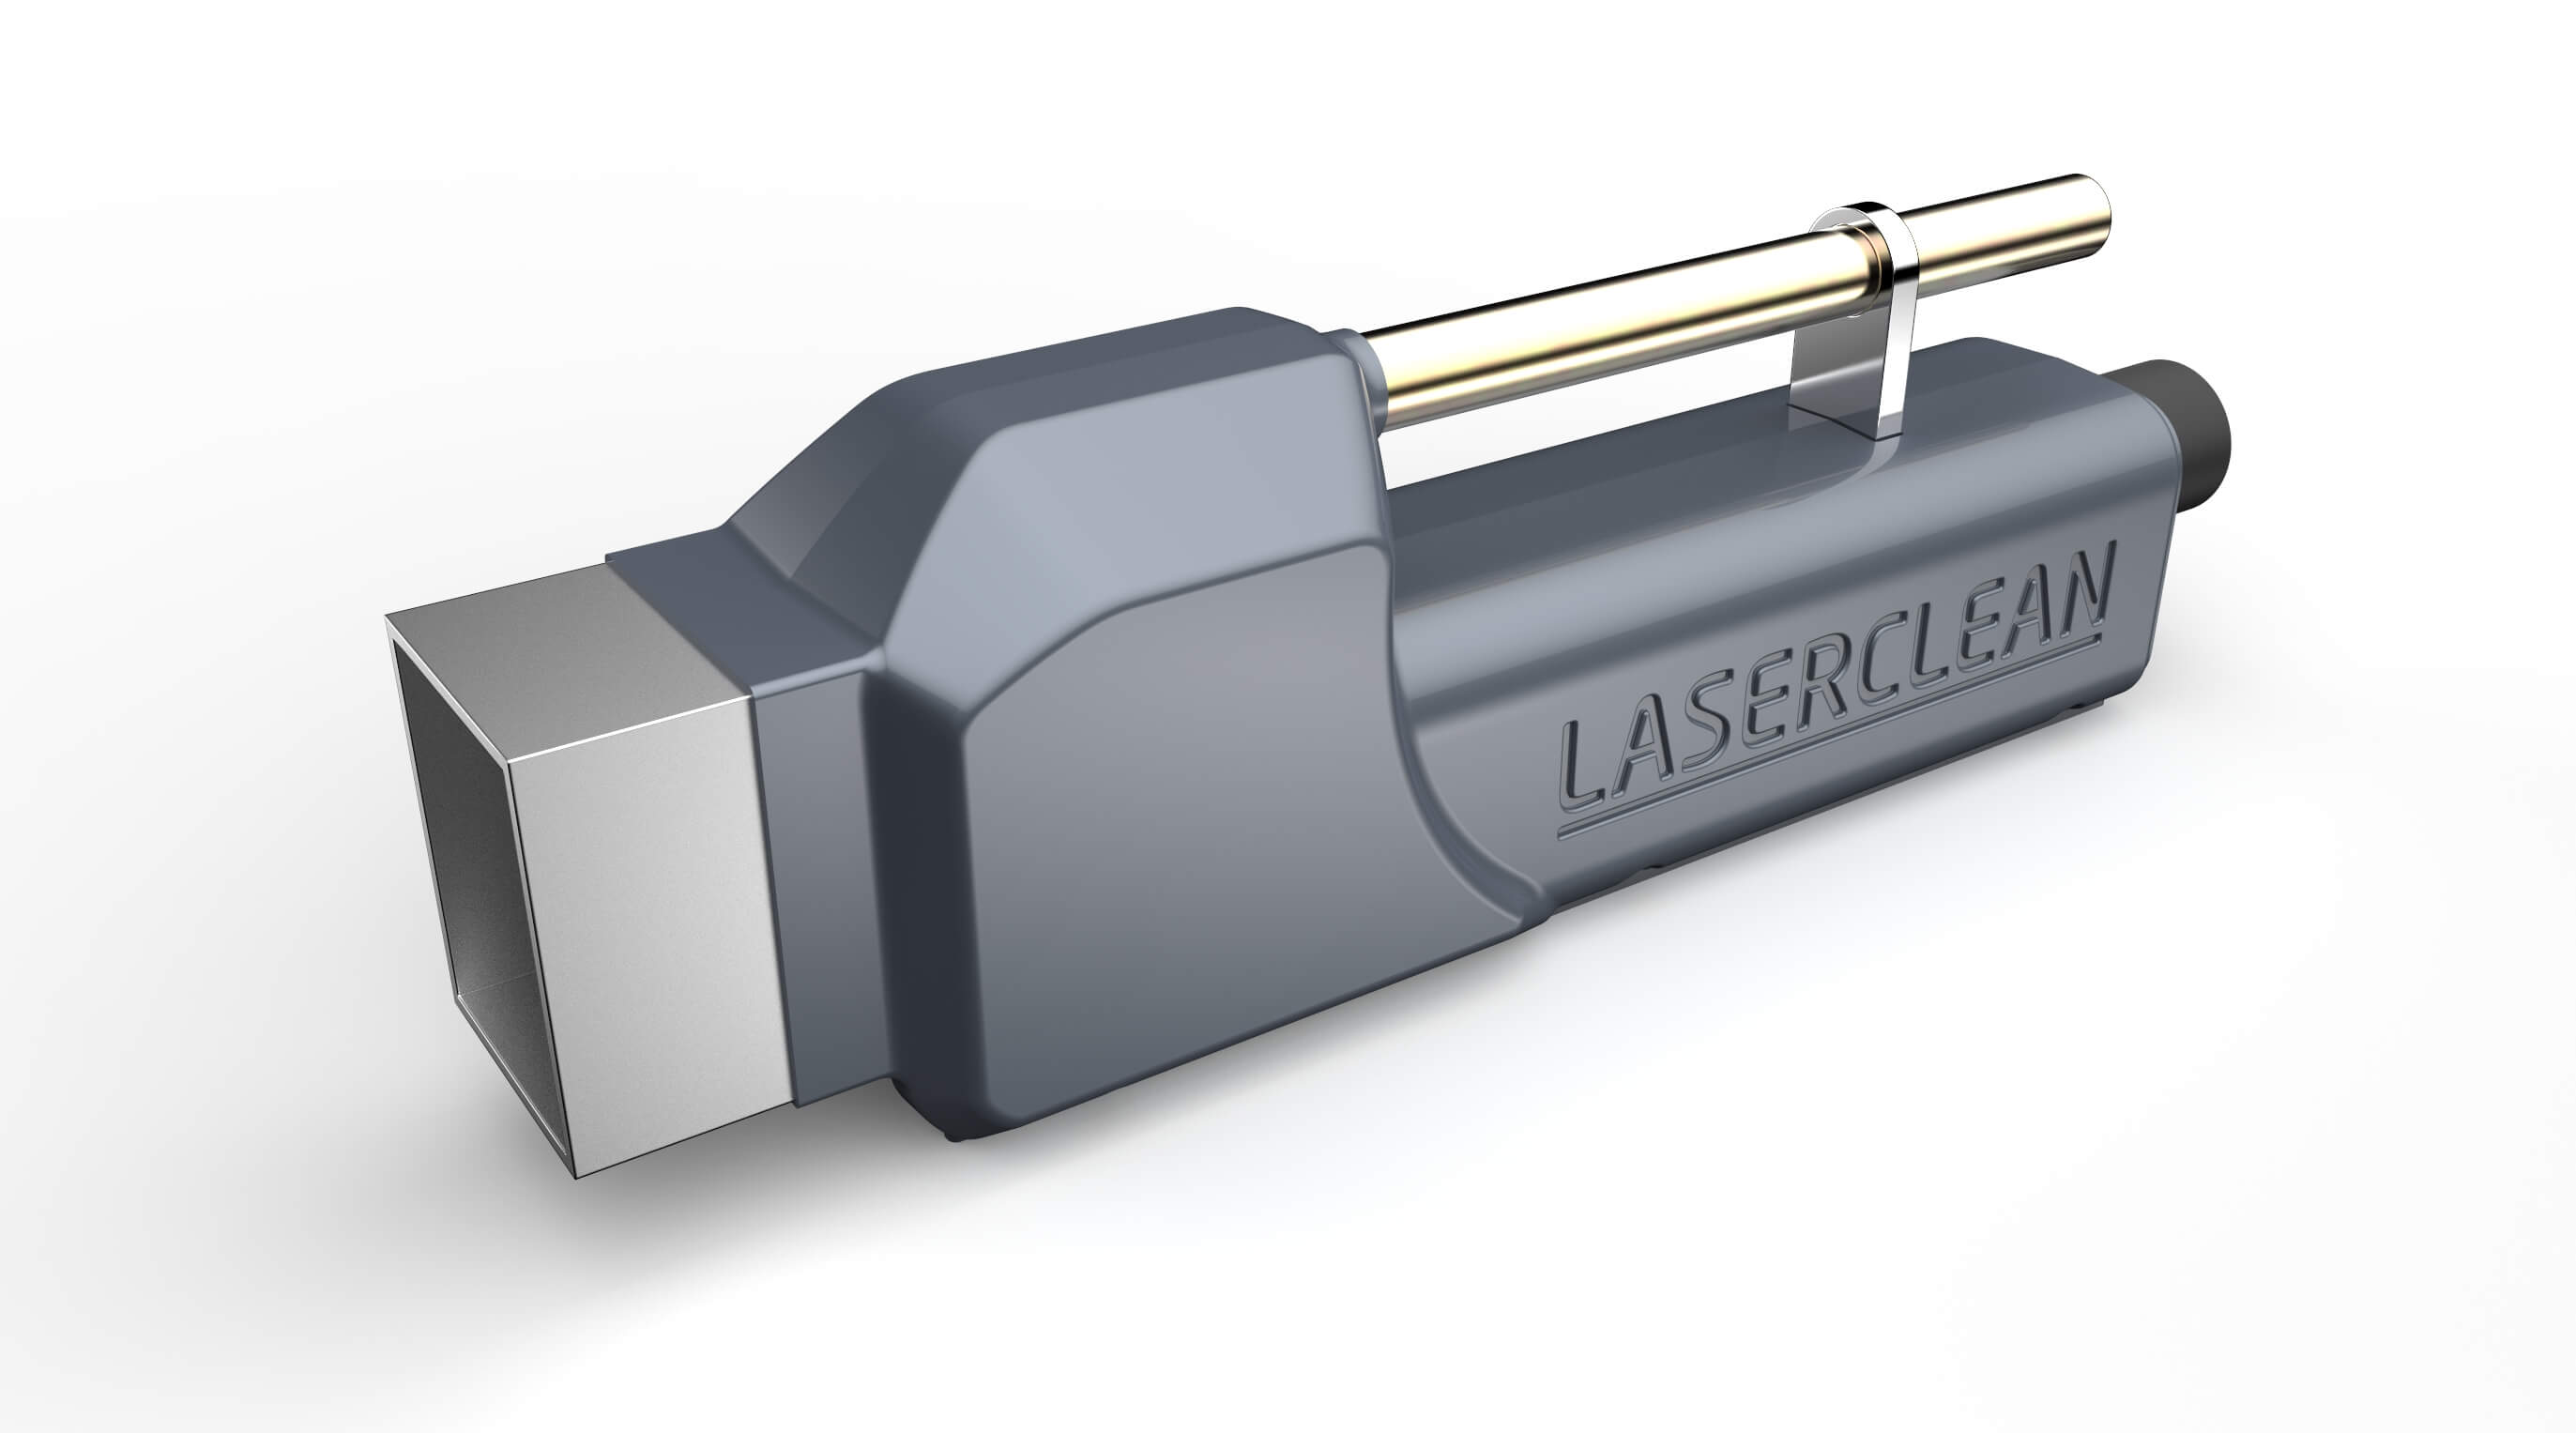 Laserclean